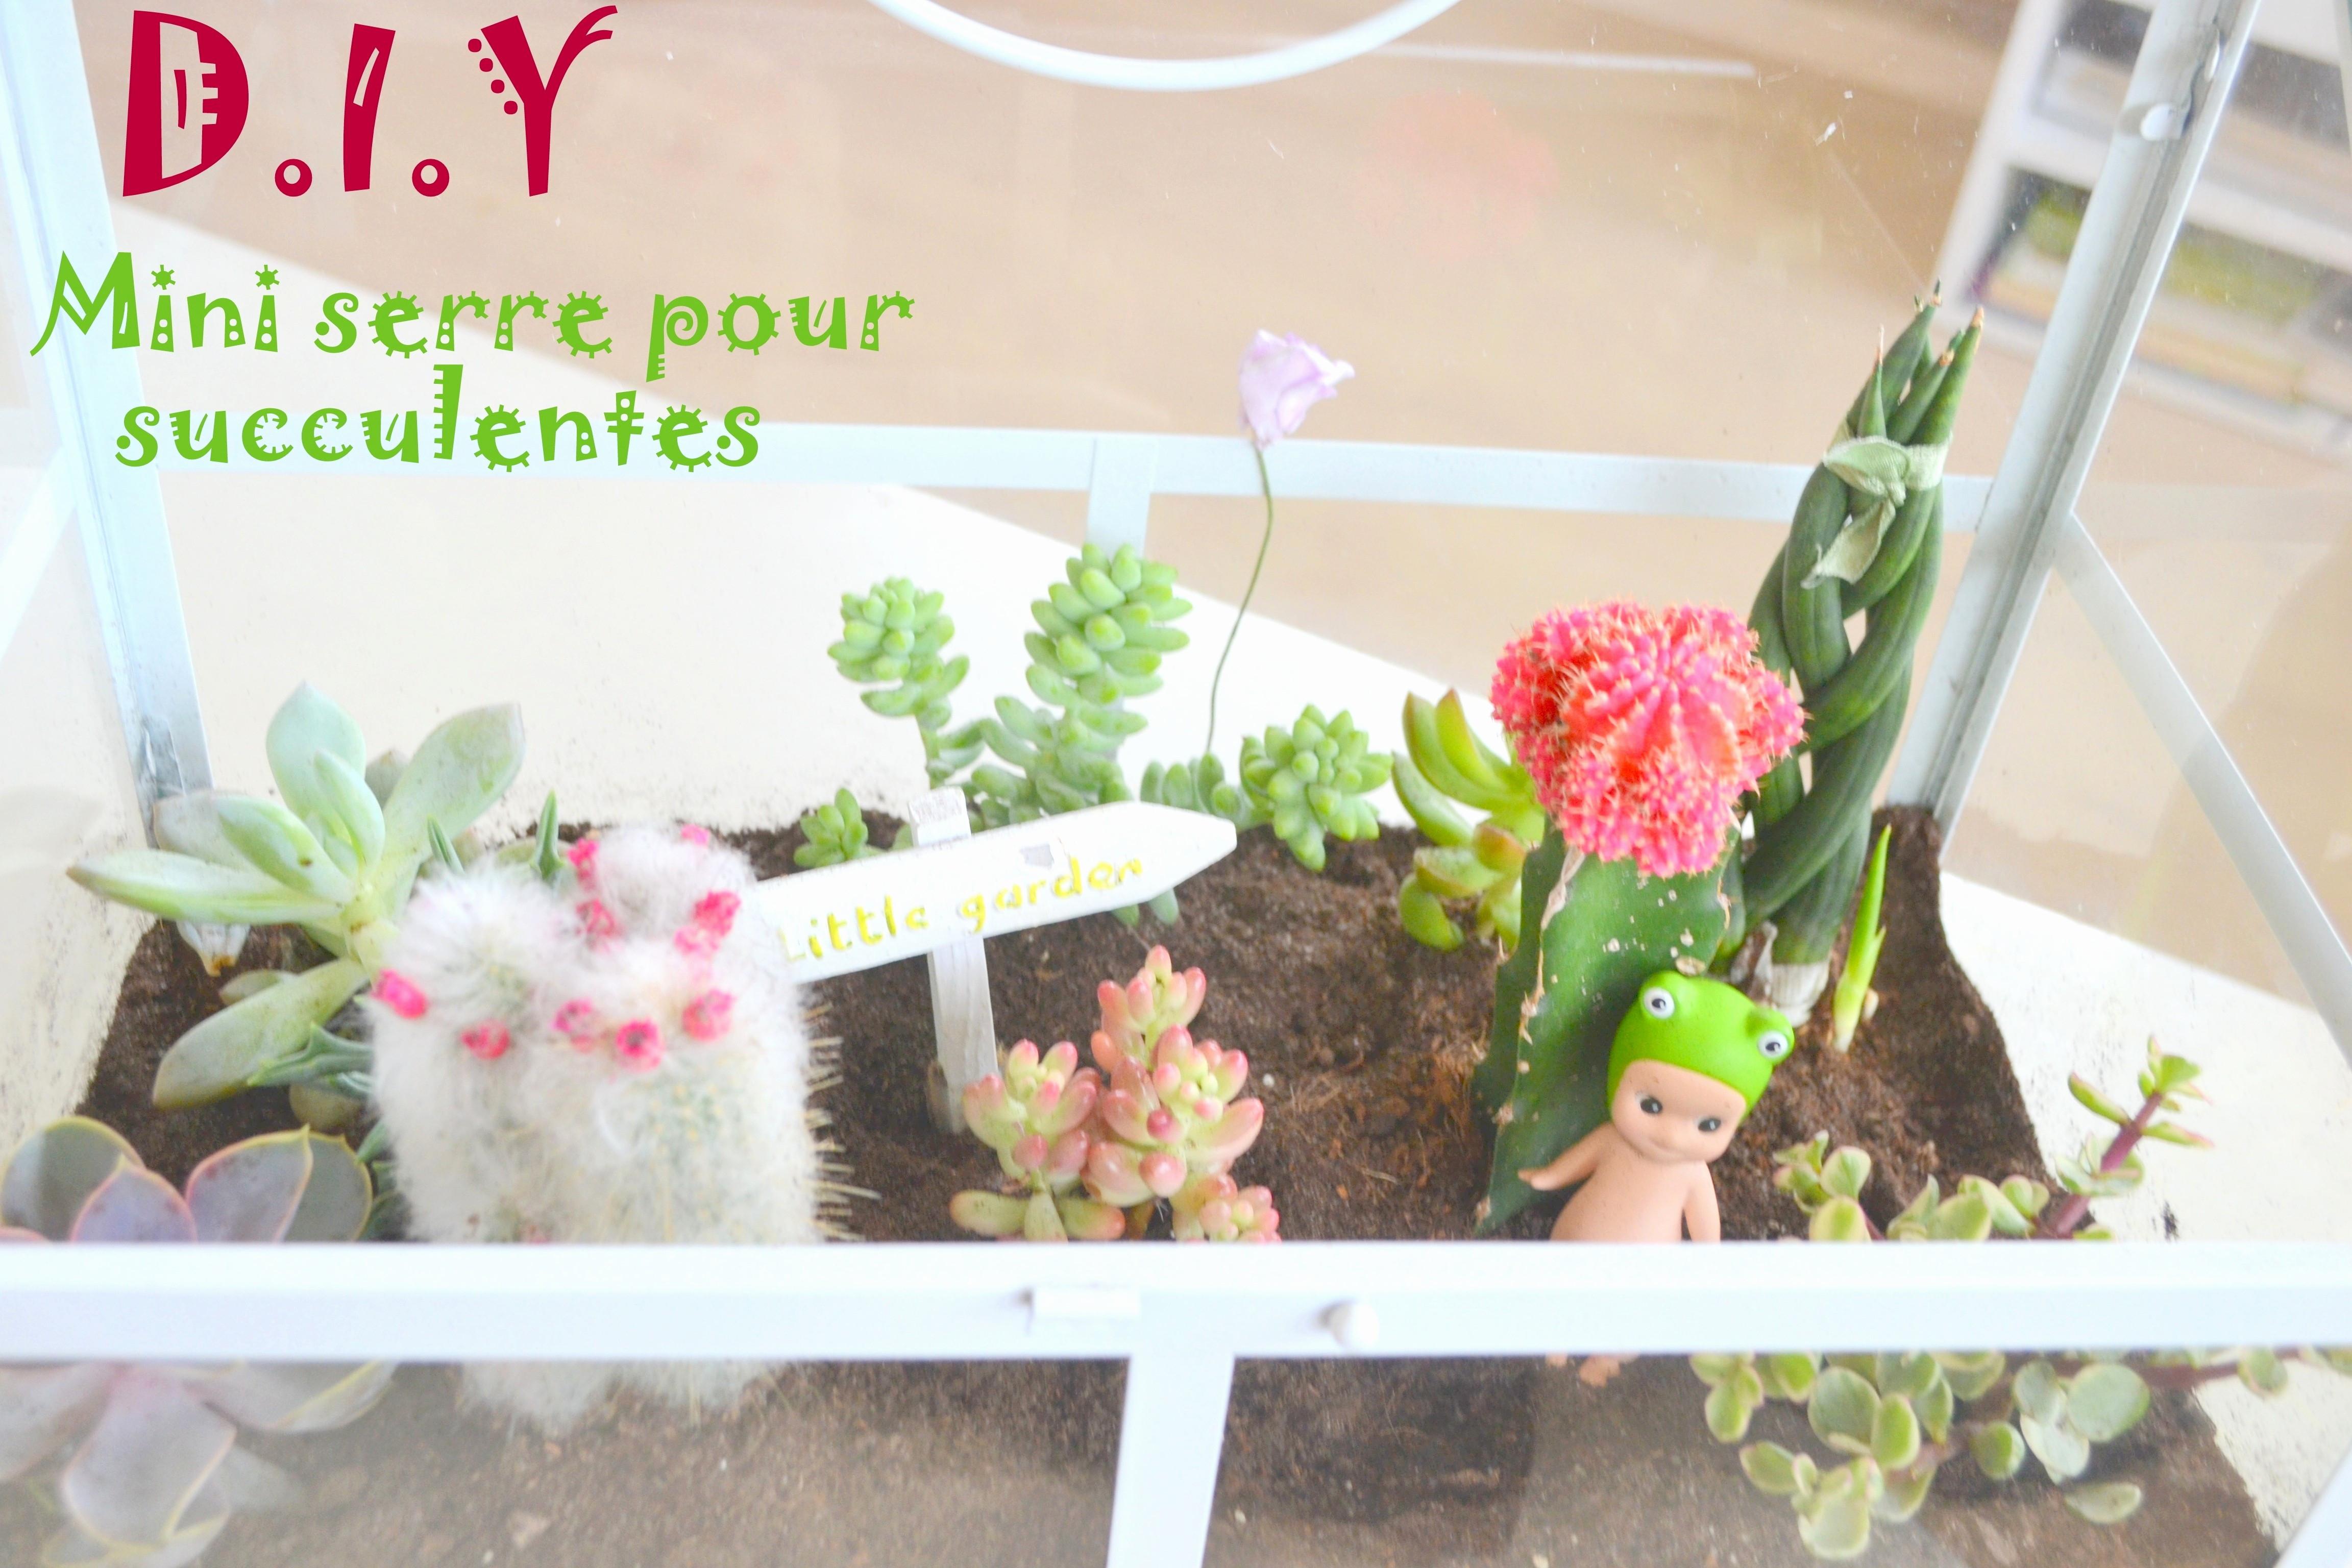 Leroy Merlin Serre De Jardin Unique Photos Fabriquer Une Serre De Jardin Inspirant Leroy Merlin Serre De Jardin